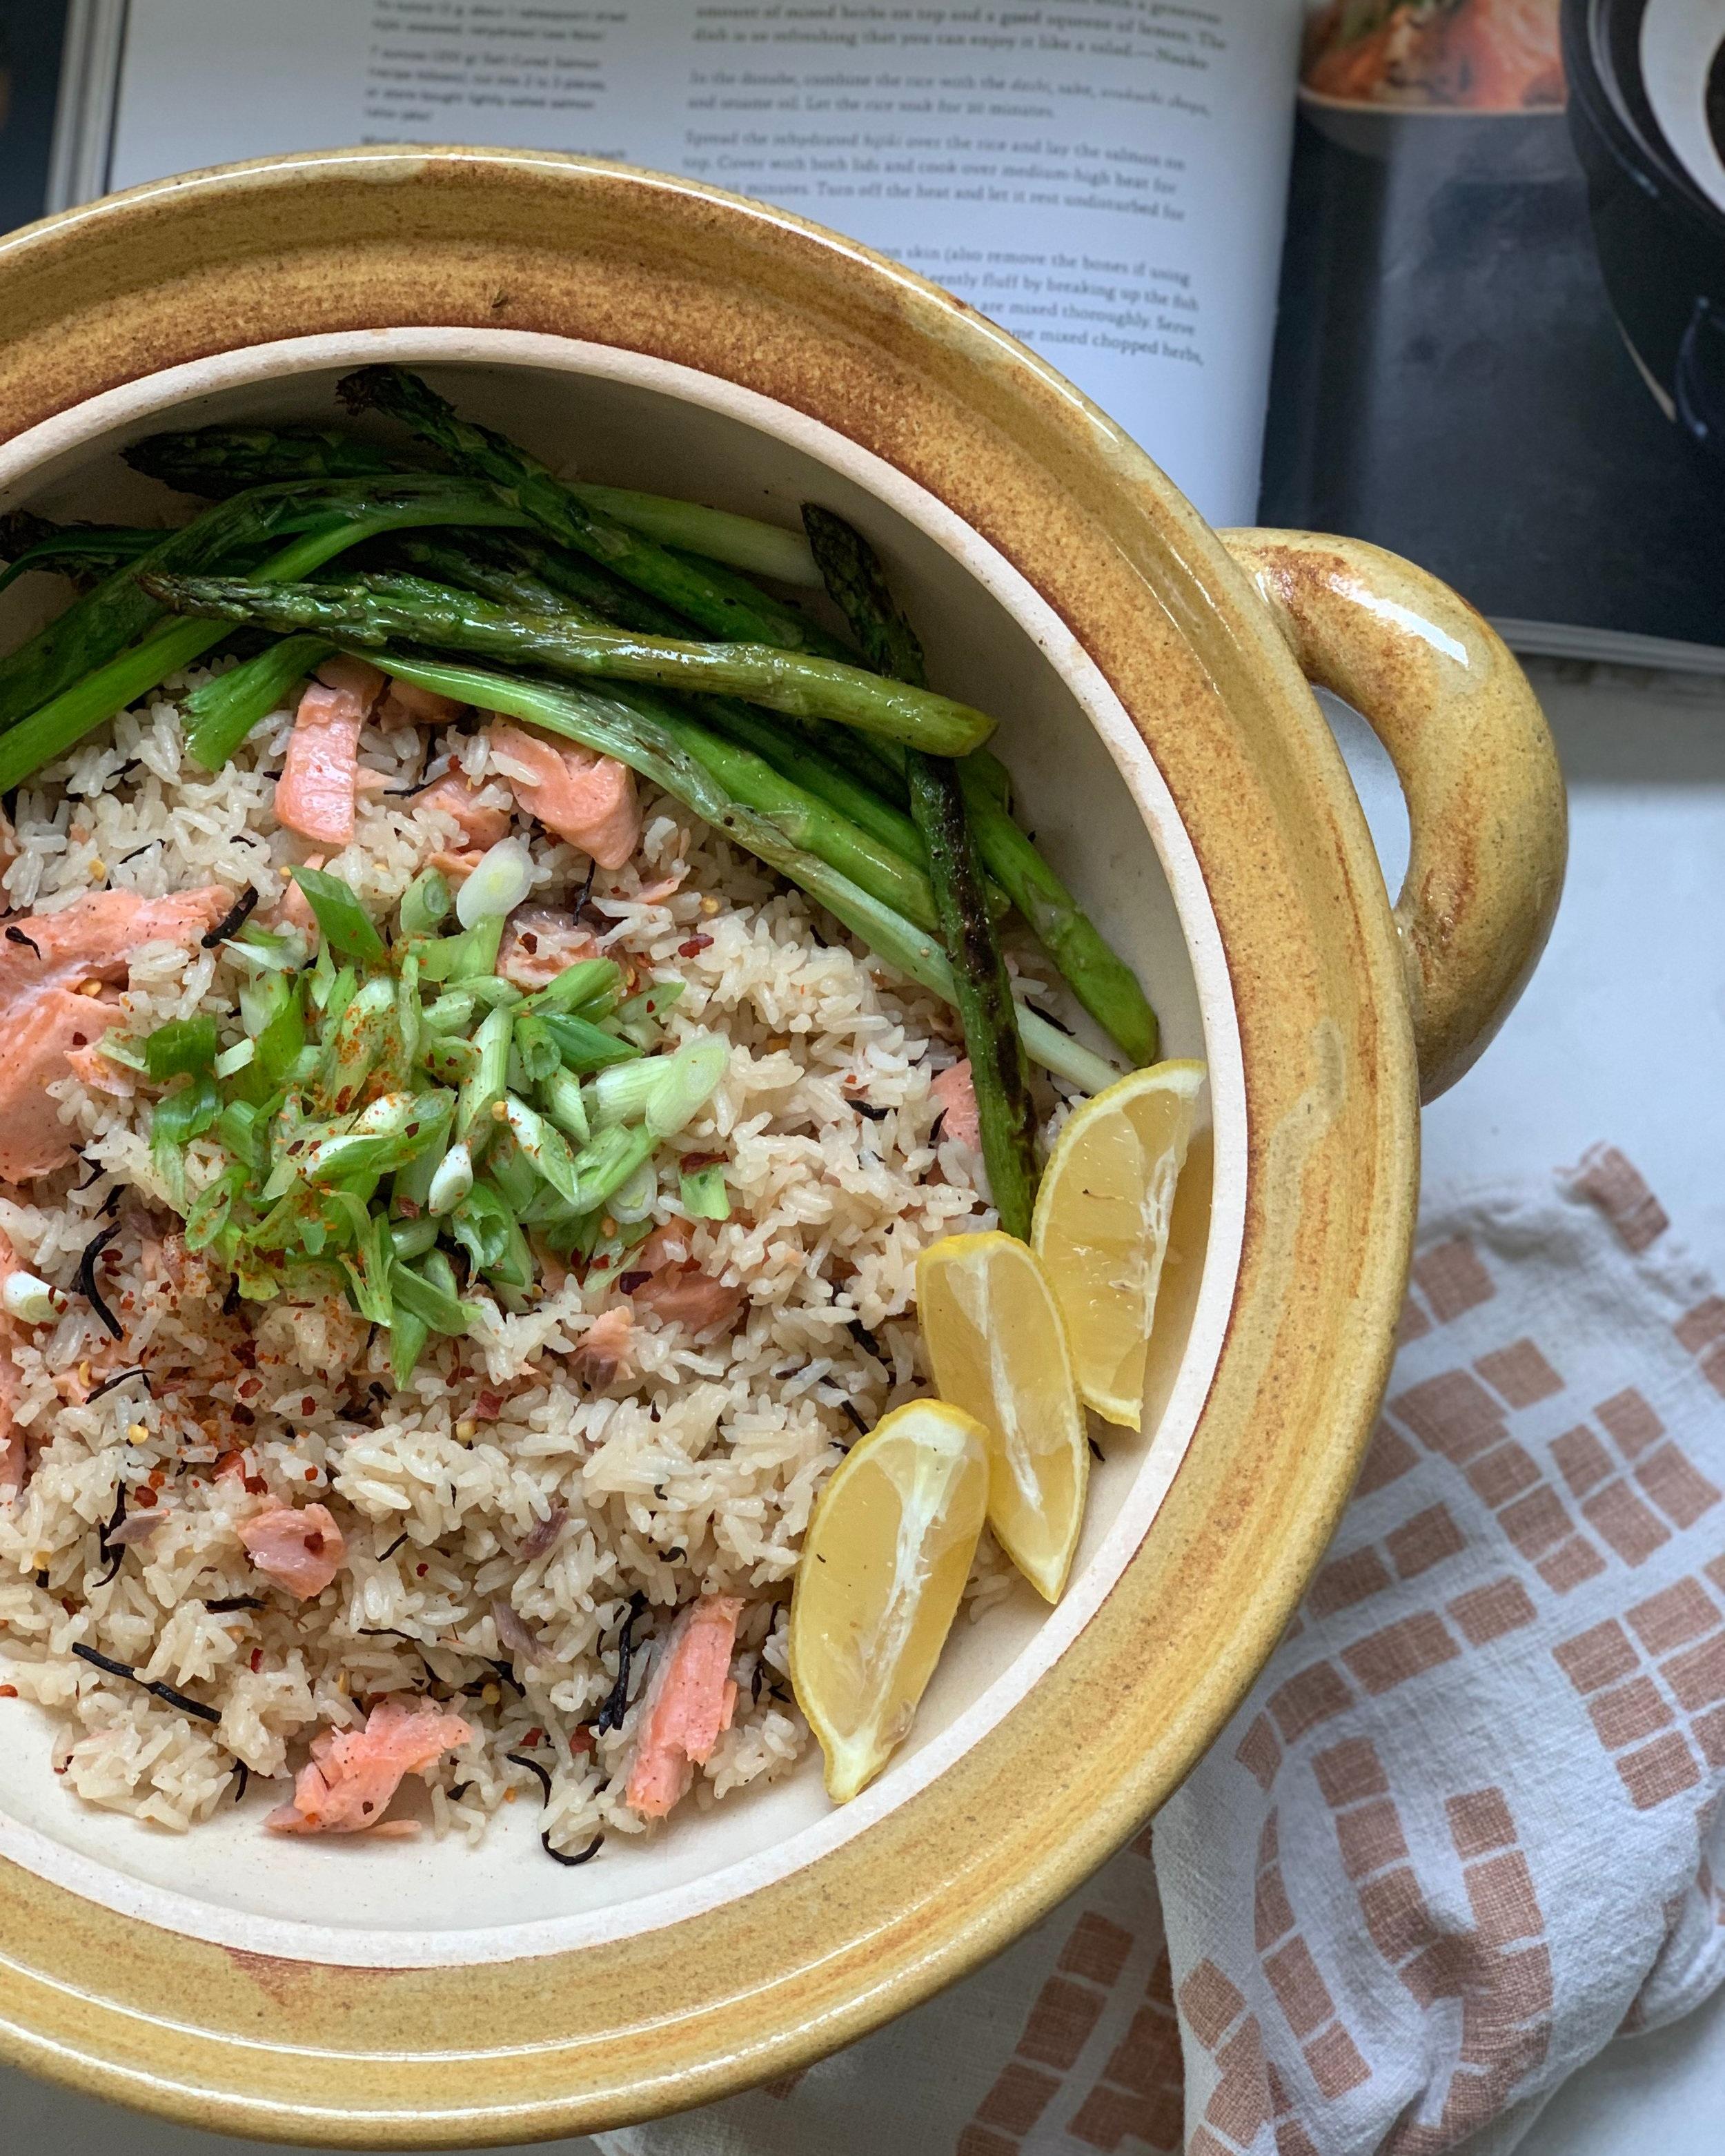 salmon+and+hijiki+seaweed+rice+whole+foods